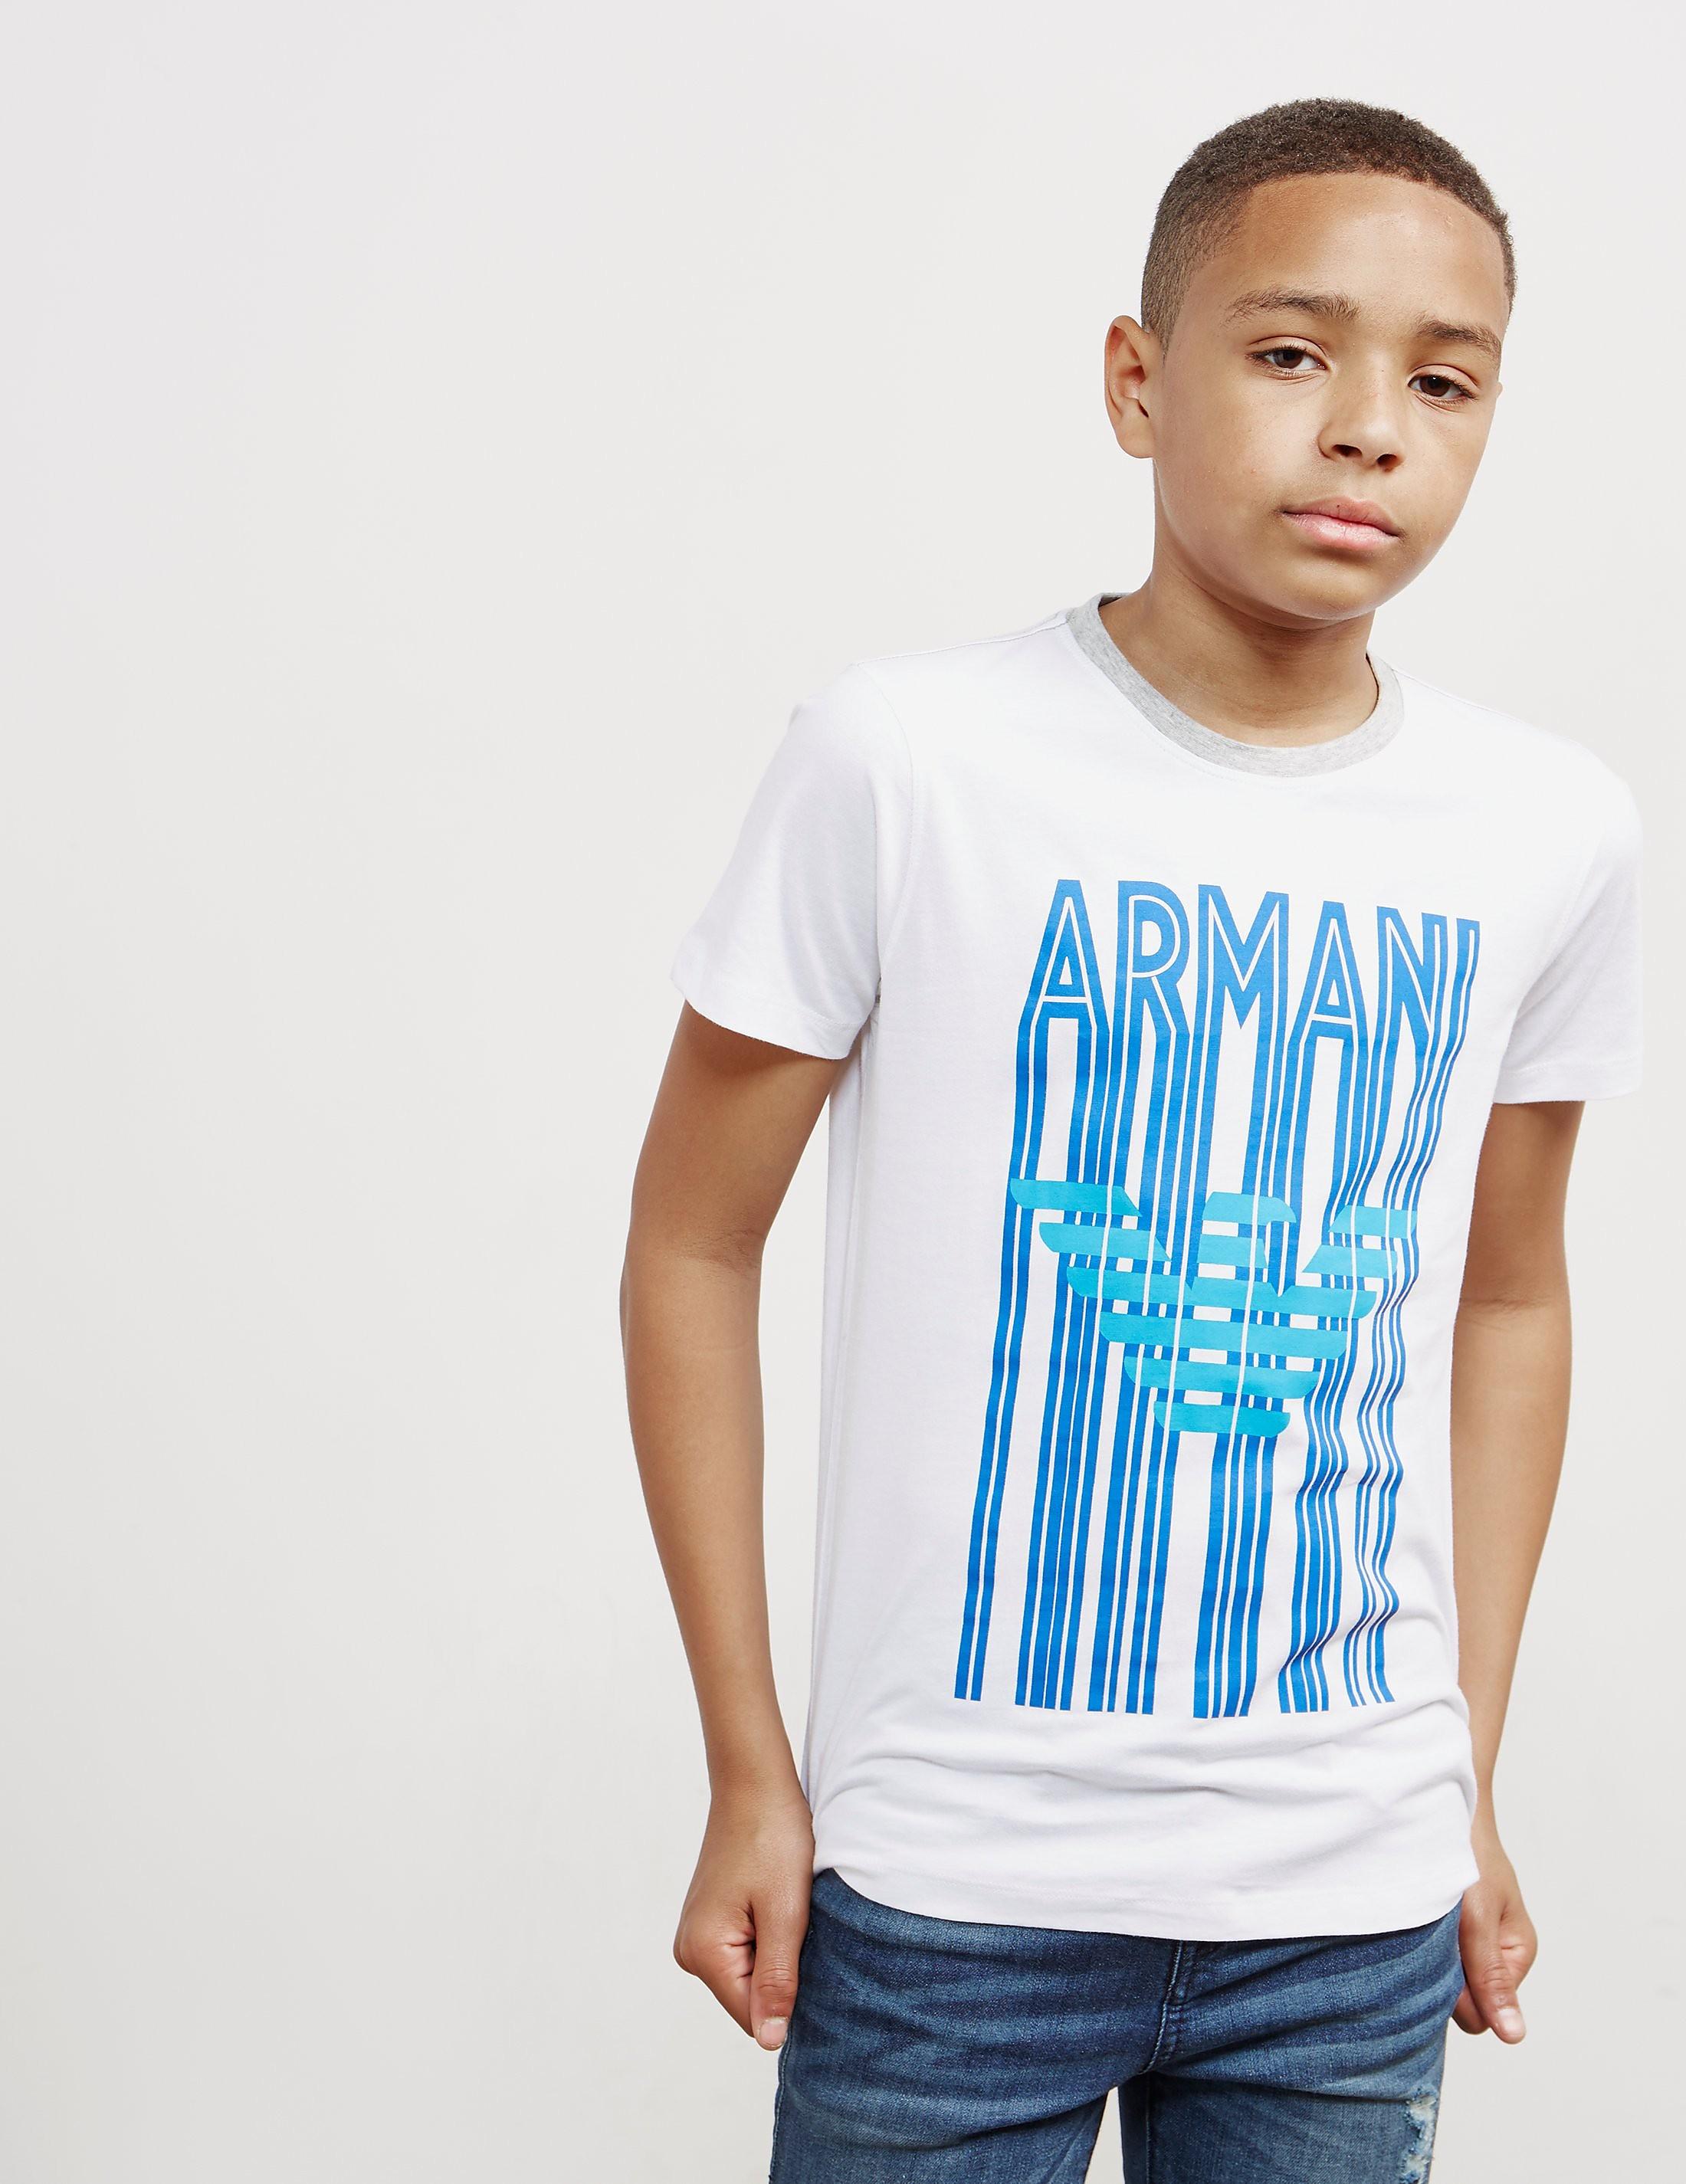 Armani Jeans 3-Pack Short Sleeve T-Shirt